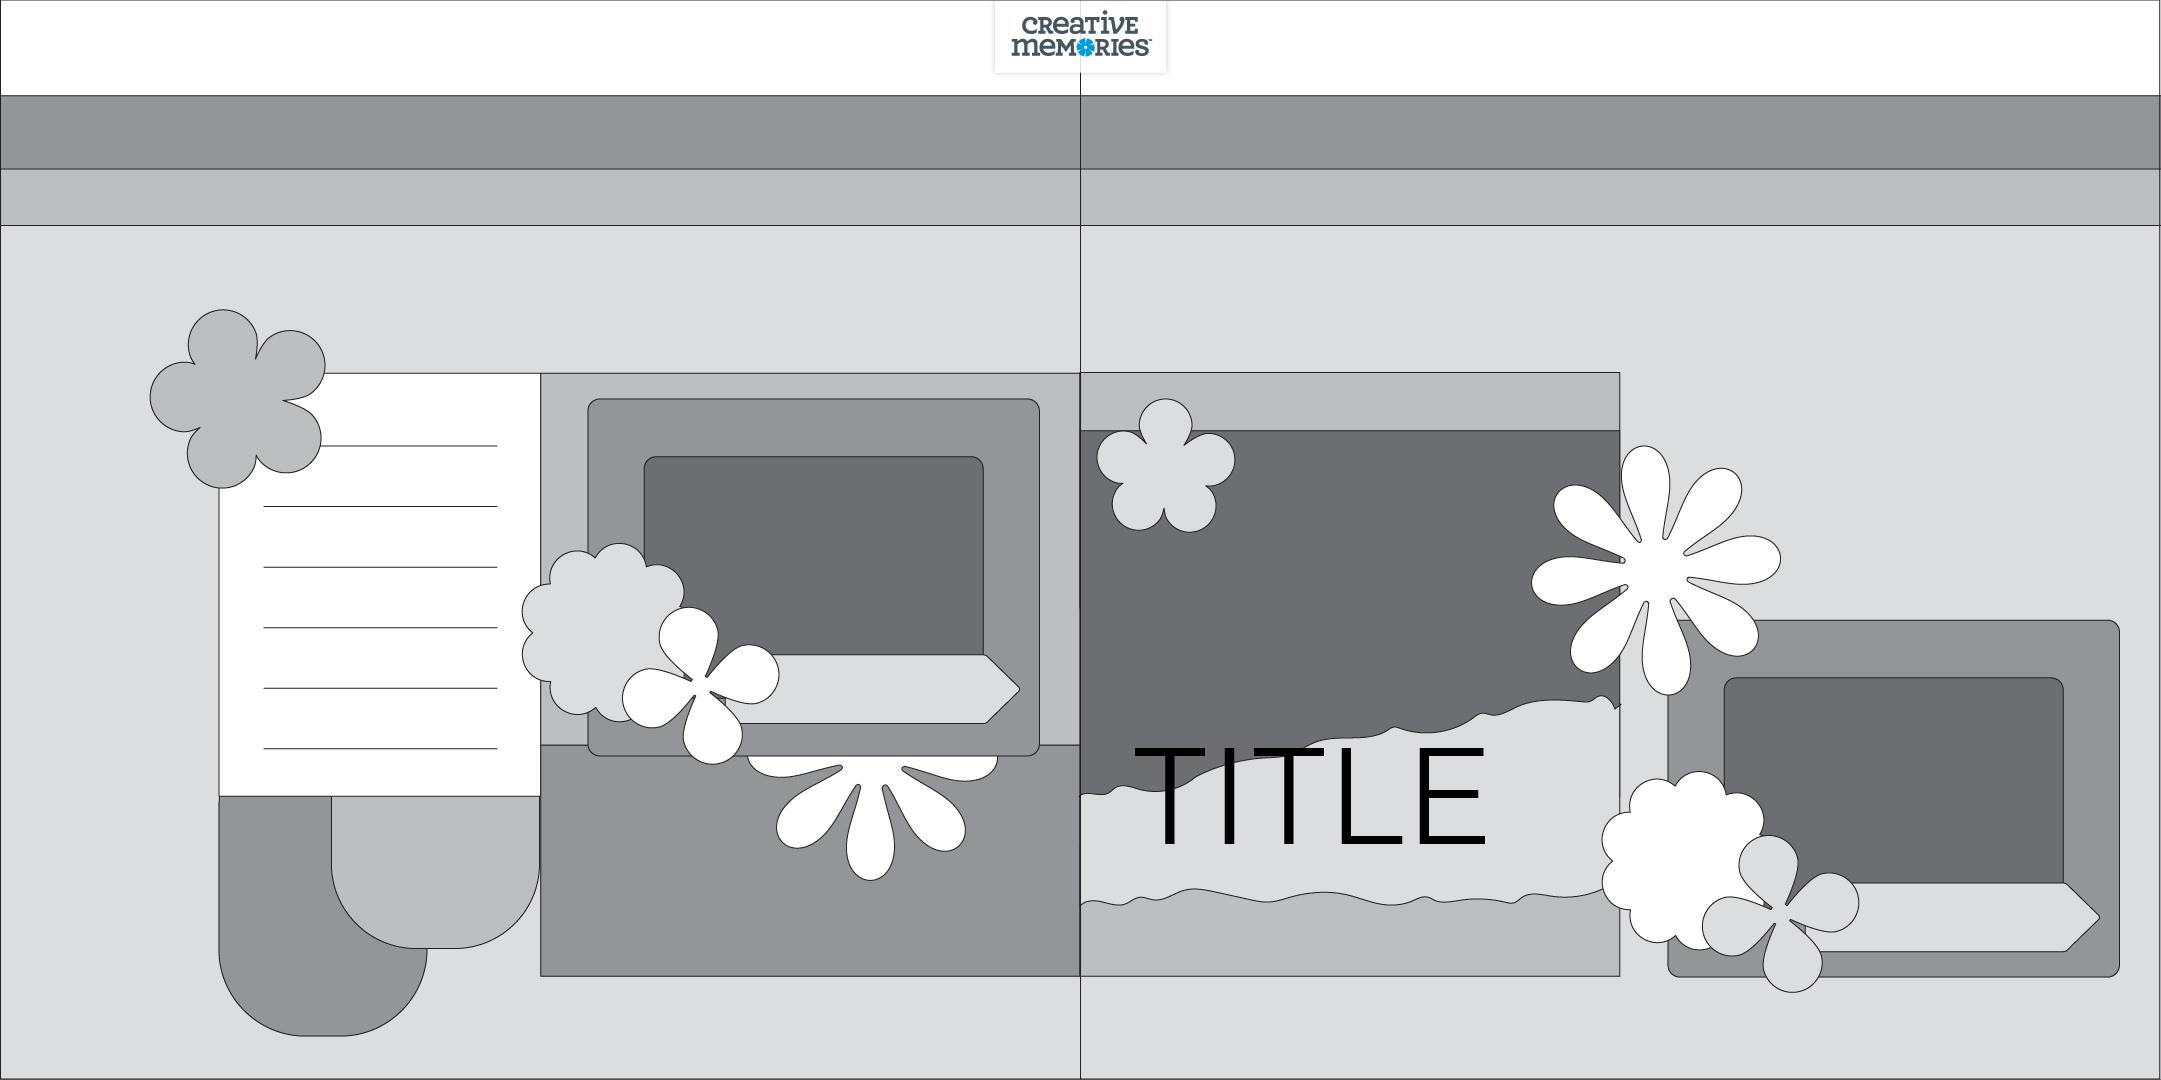 Seasons-Greetings-Scrapbook-Sketch-Creative-Memories